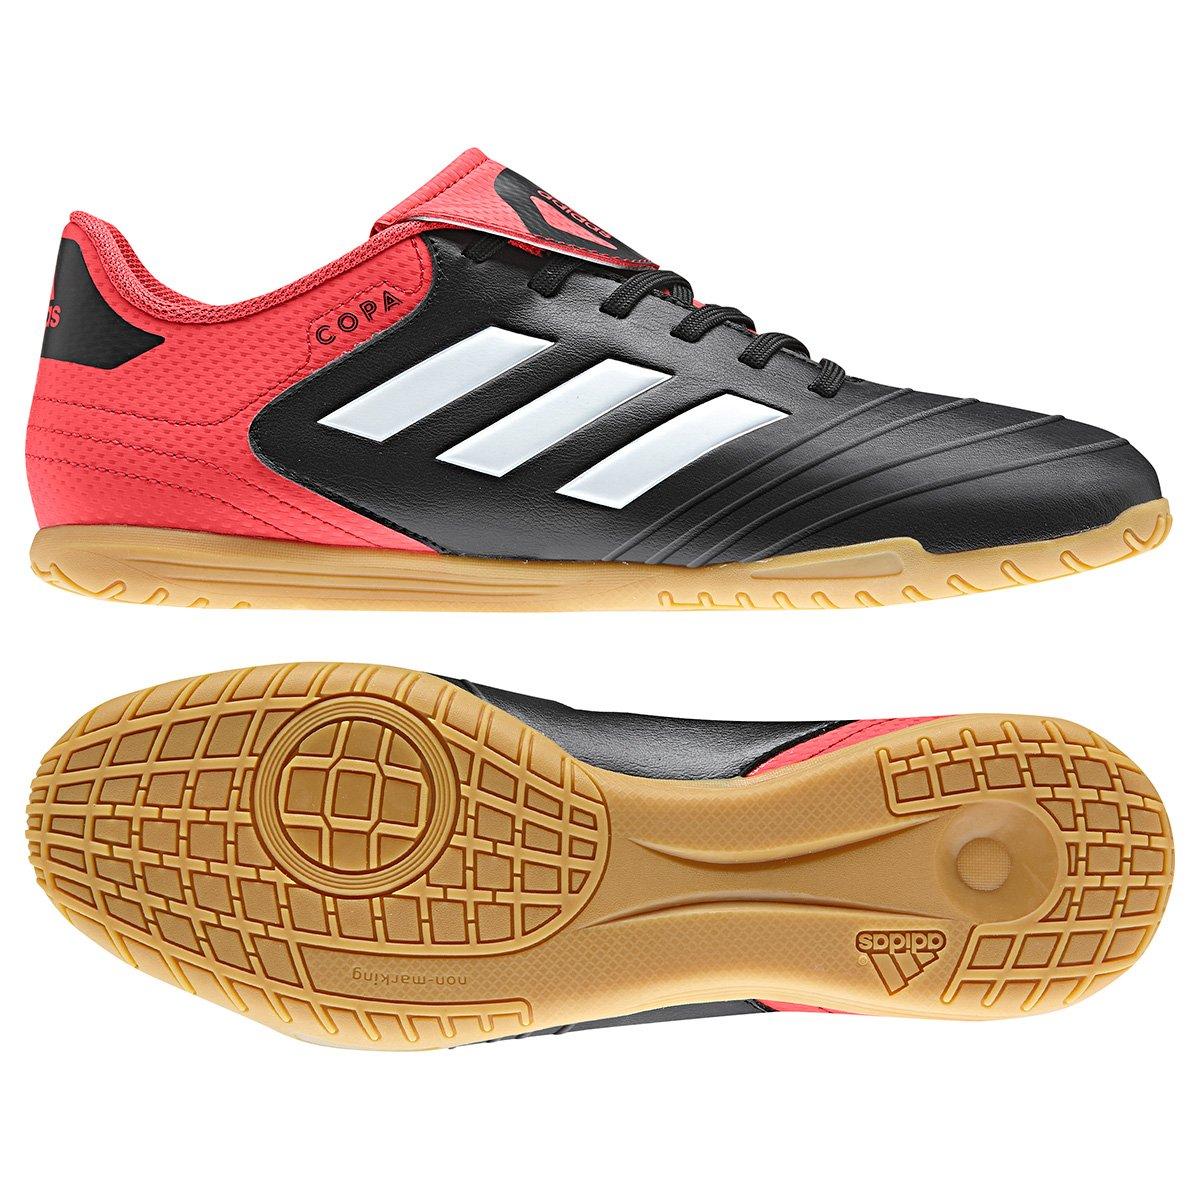 85e7bf221f Chuteira Futsal Adidas Copa 18.4 IN